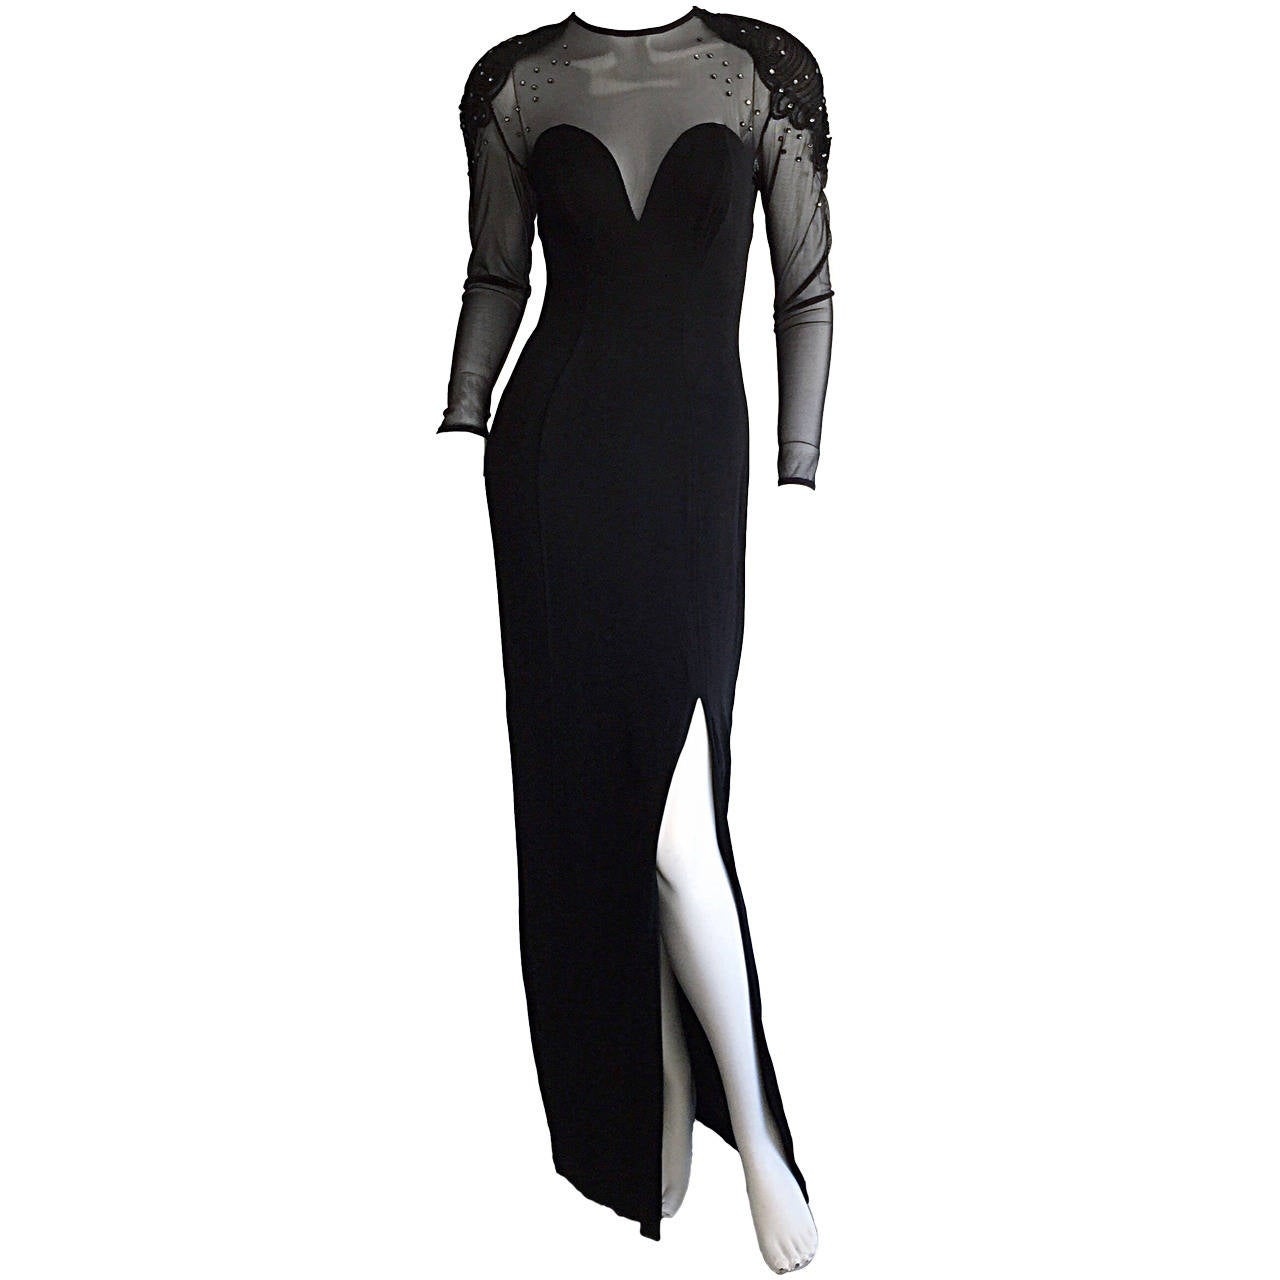 Sexy Vintage 1990s Black Cut - Out Bodycon Dress w/ Rhinestones 1